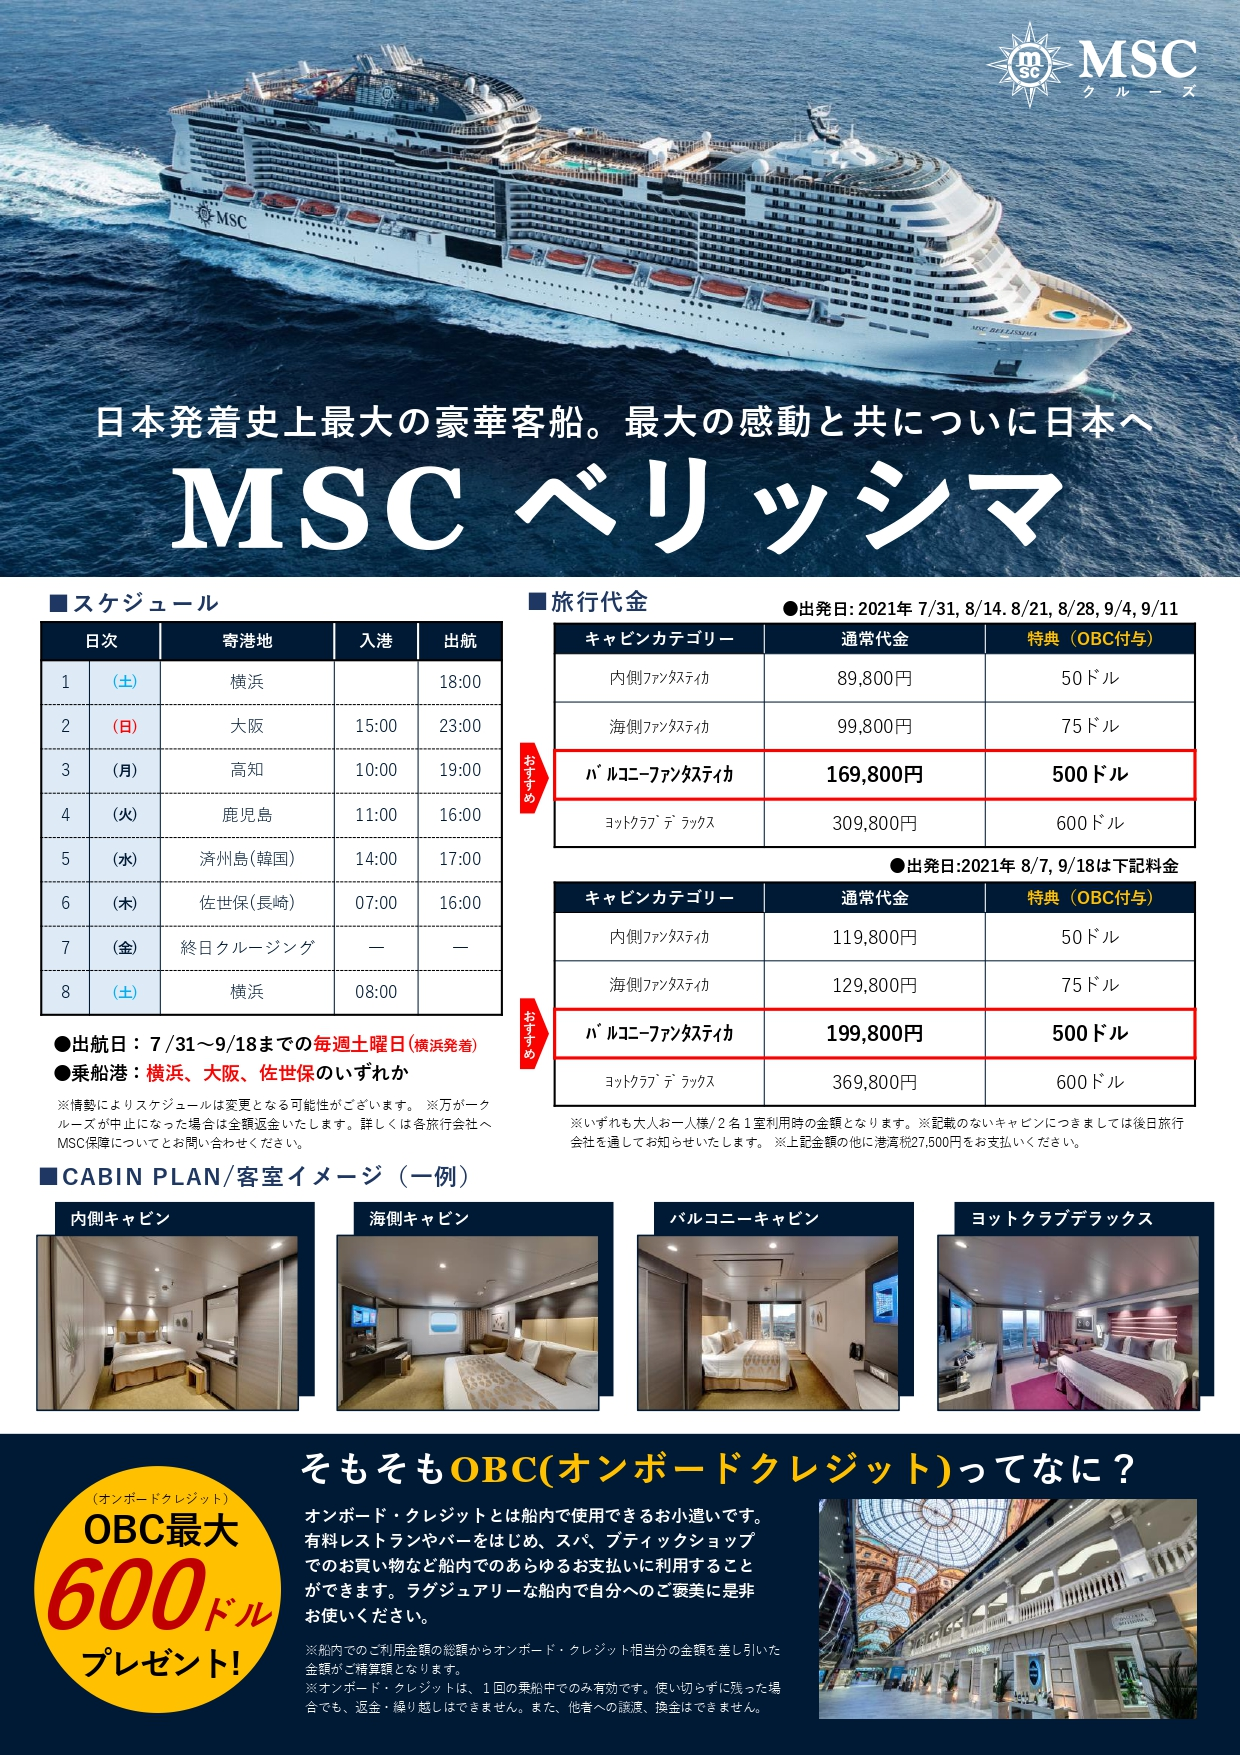 MSCベリッシマ 2021年7月~9月日本発着クルーズ